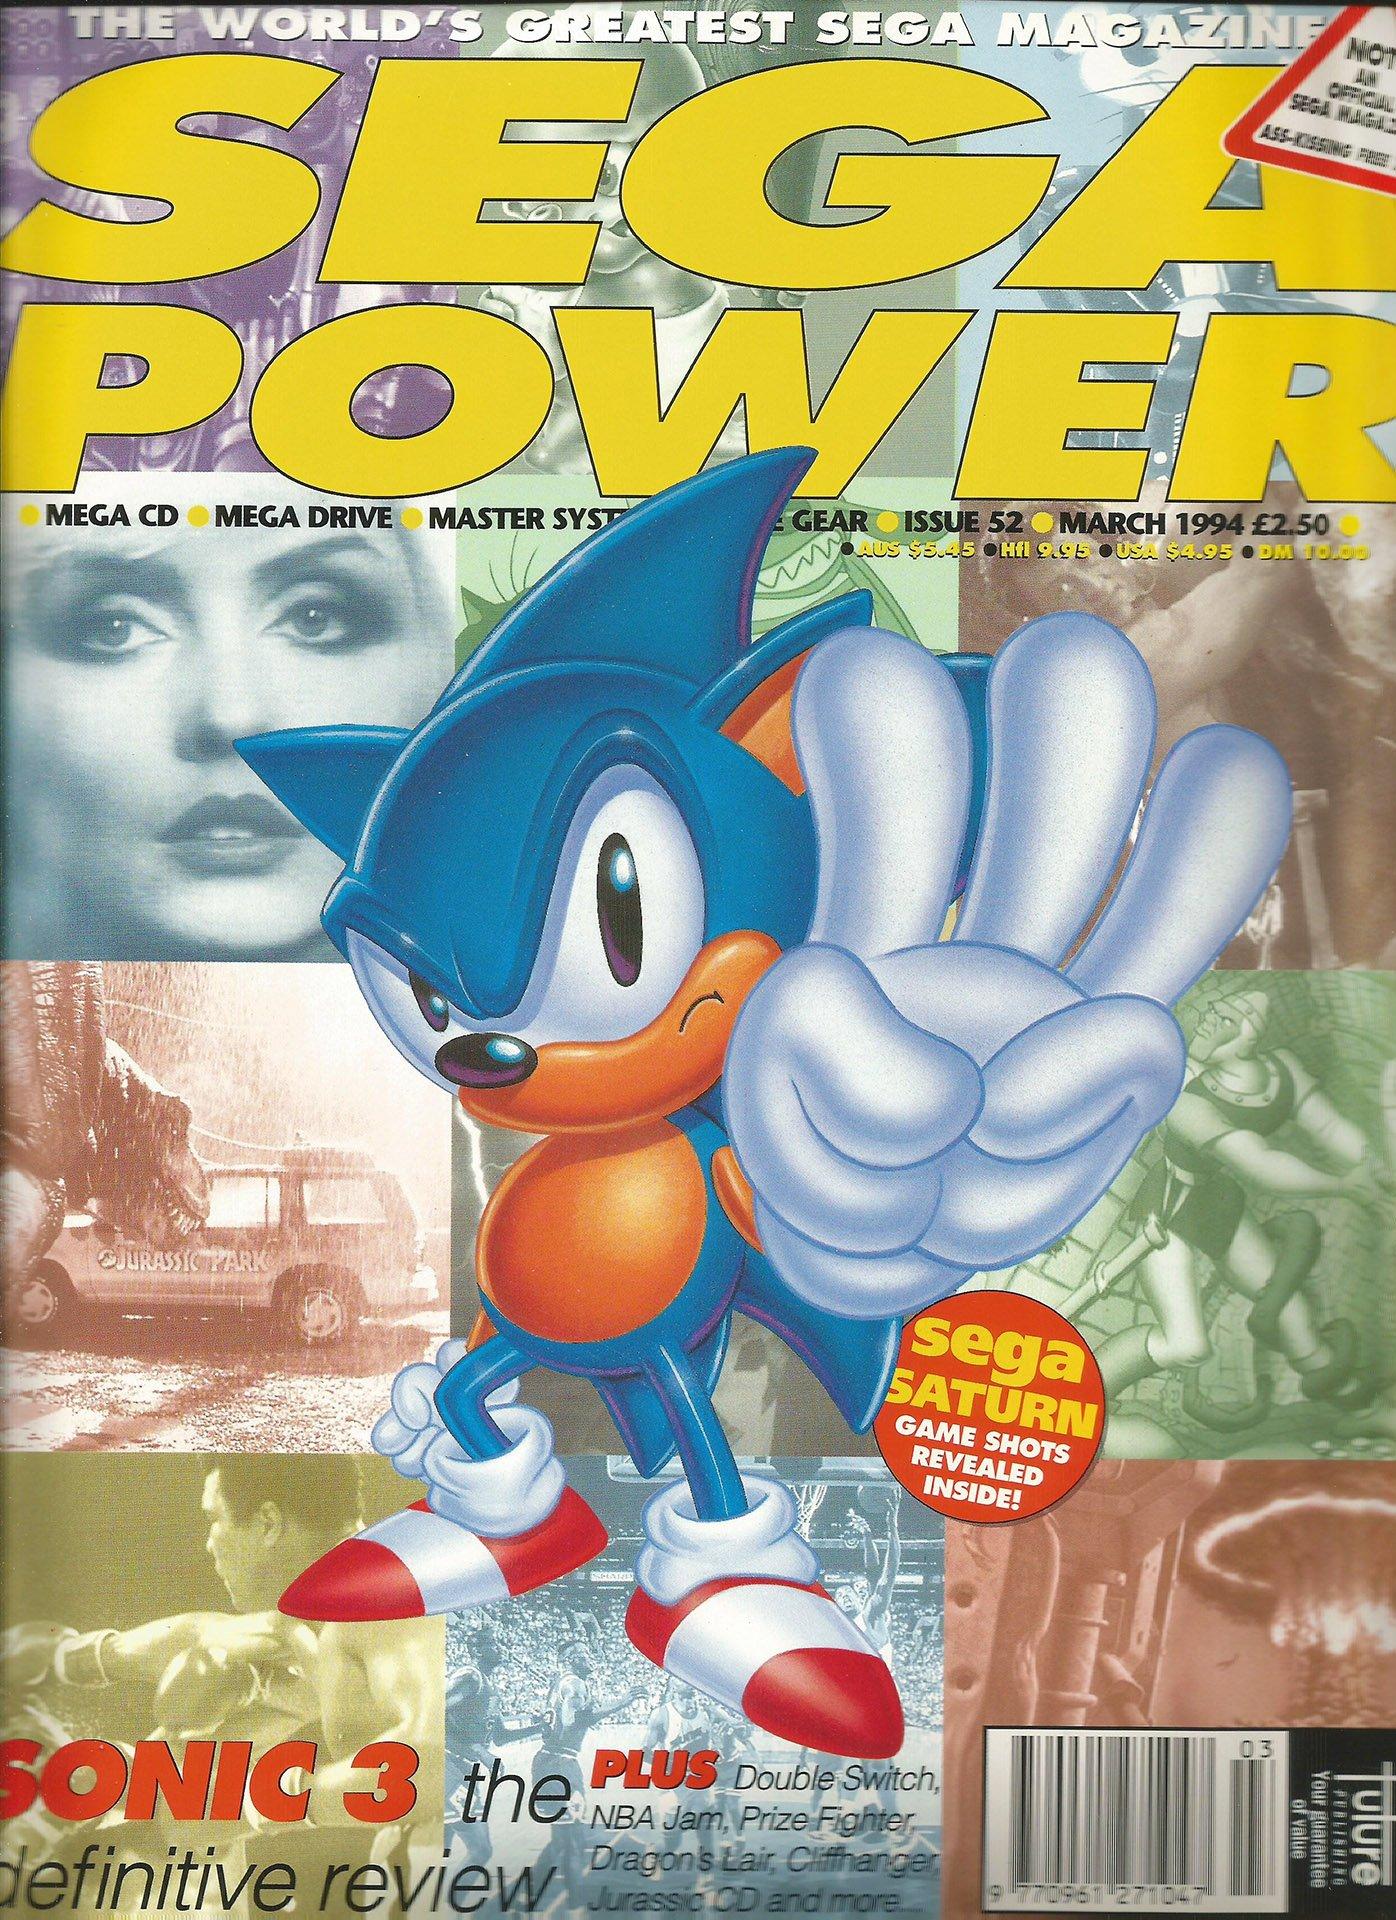 Sega Power Issue 52 (March 1994)